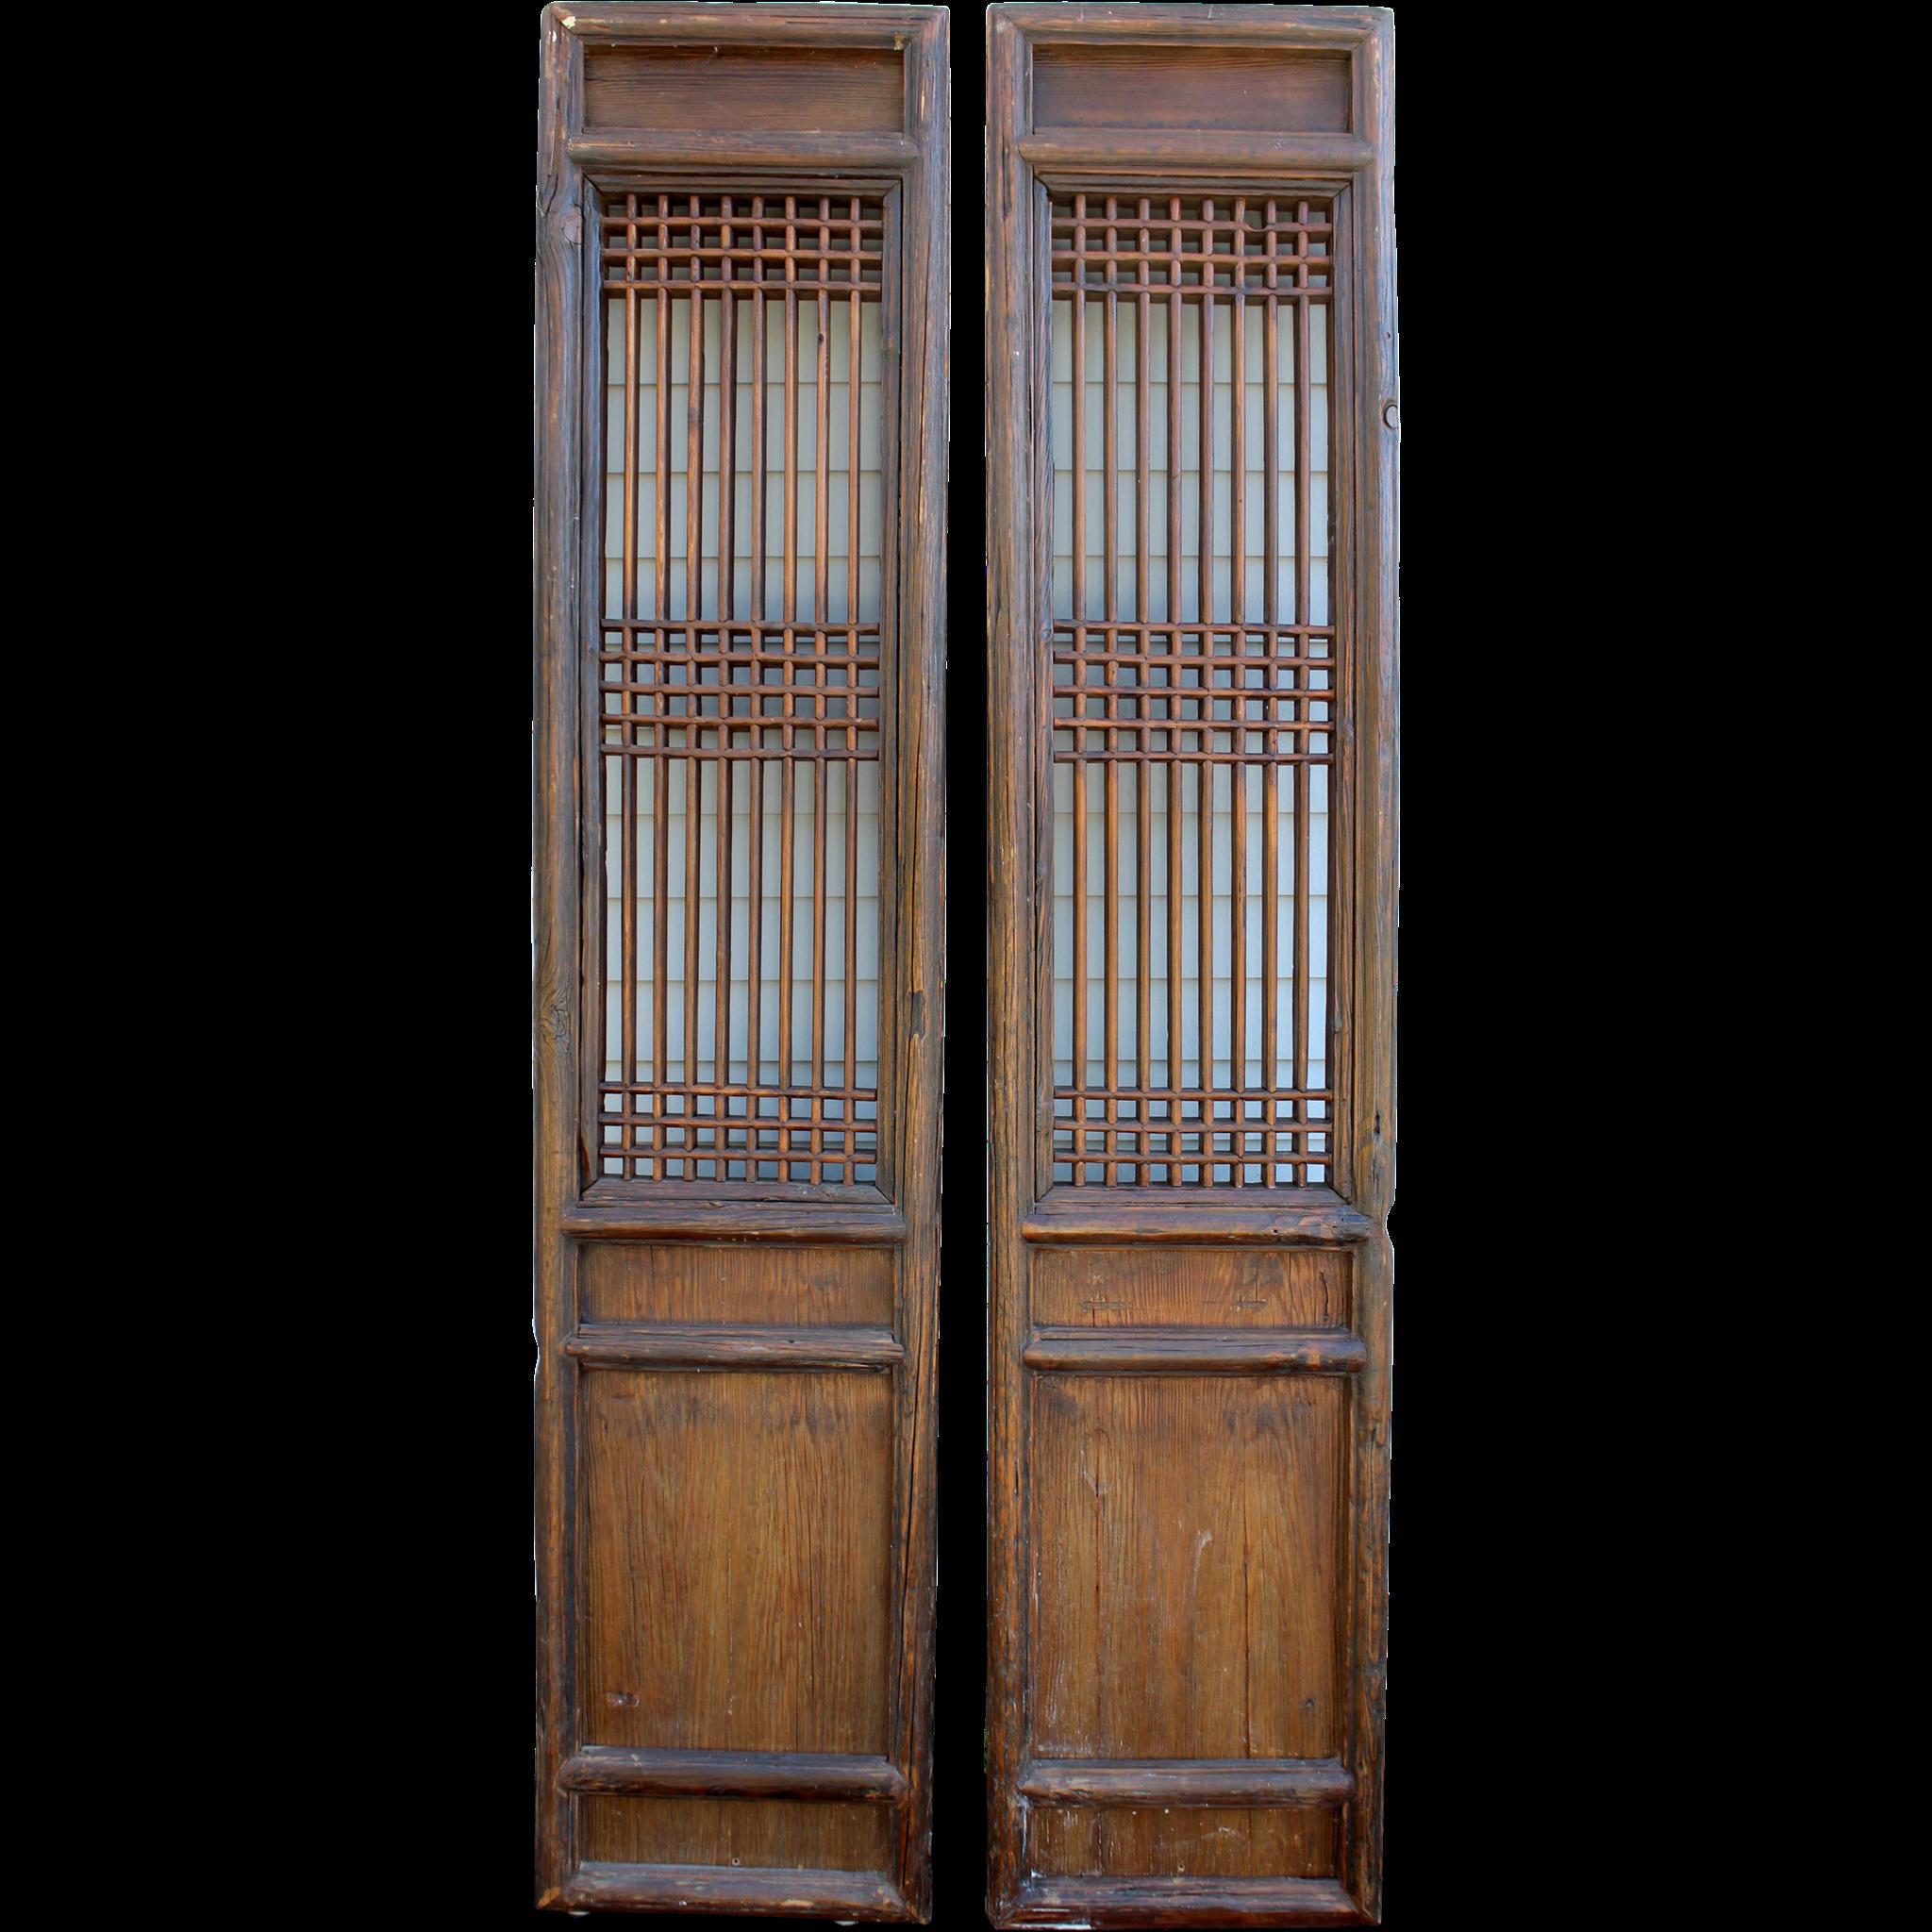 Pair of 19th Century - 20th Century Chinese Hardwood Reticulated Doors